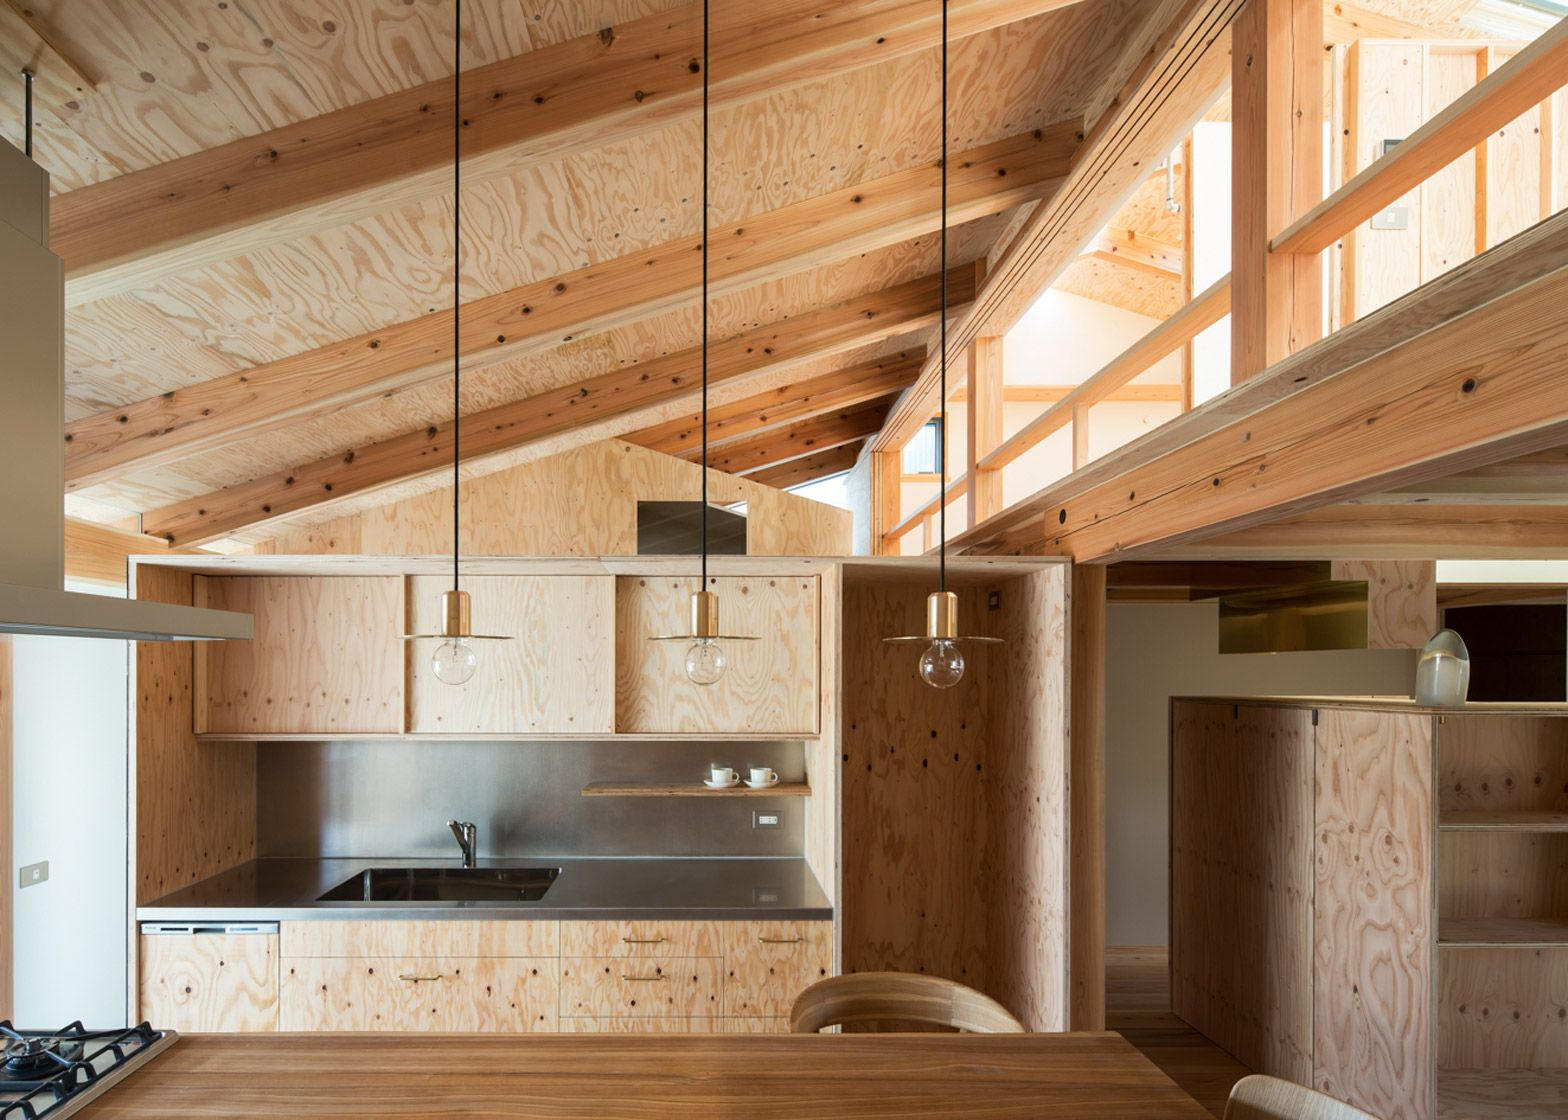 Small house by Hitotomori has custom made plywood interior